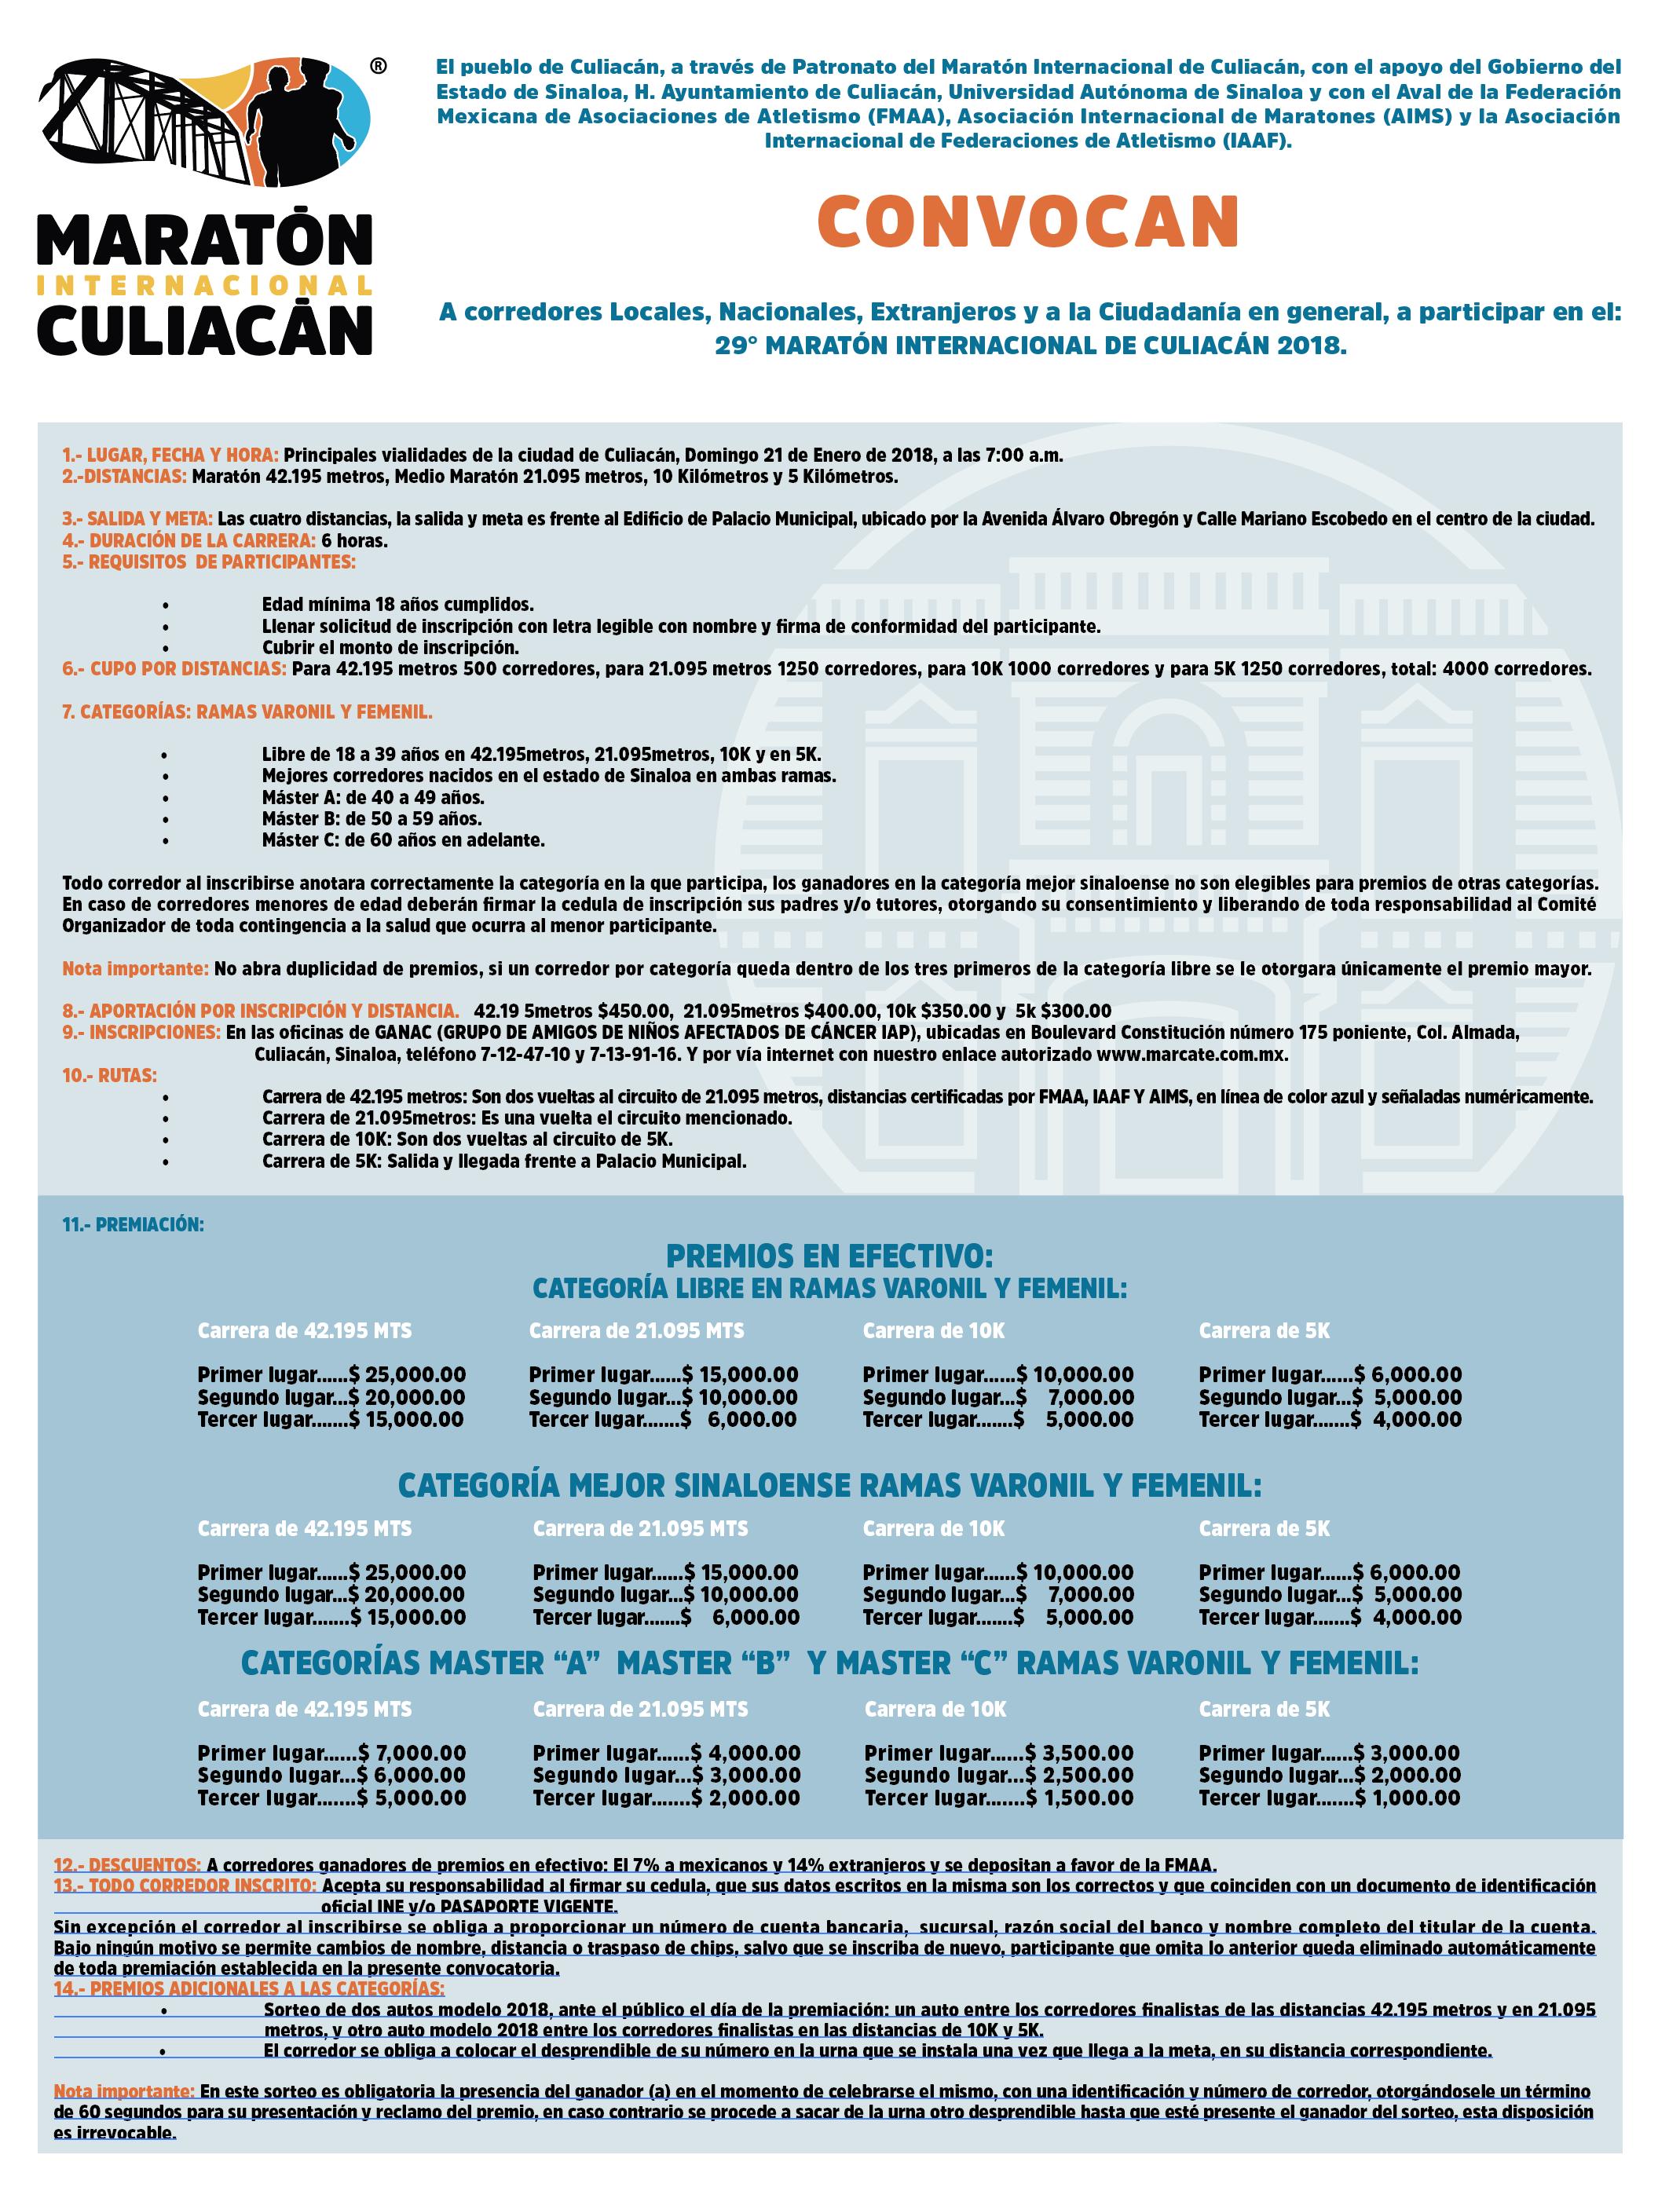 XXIX Internacional de Culiacán 2018